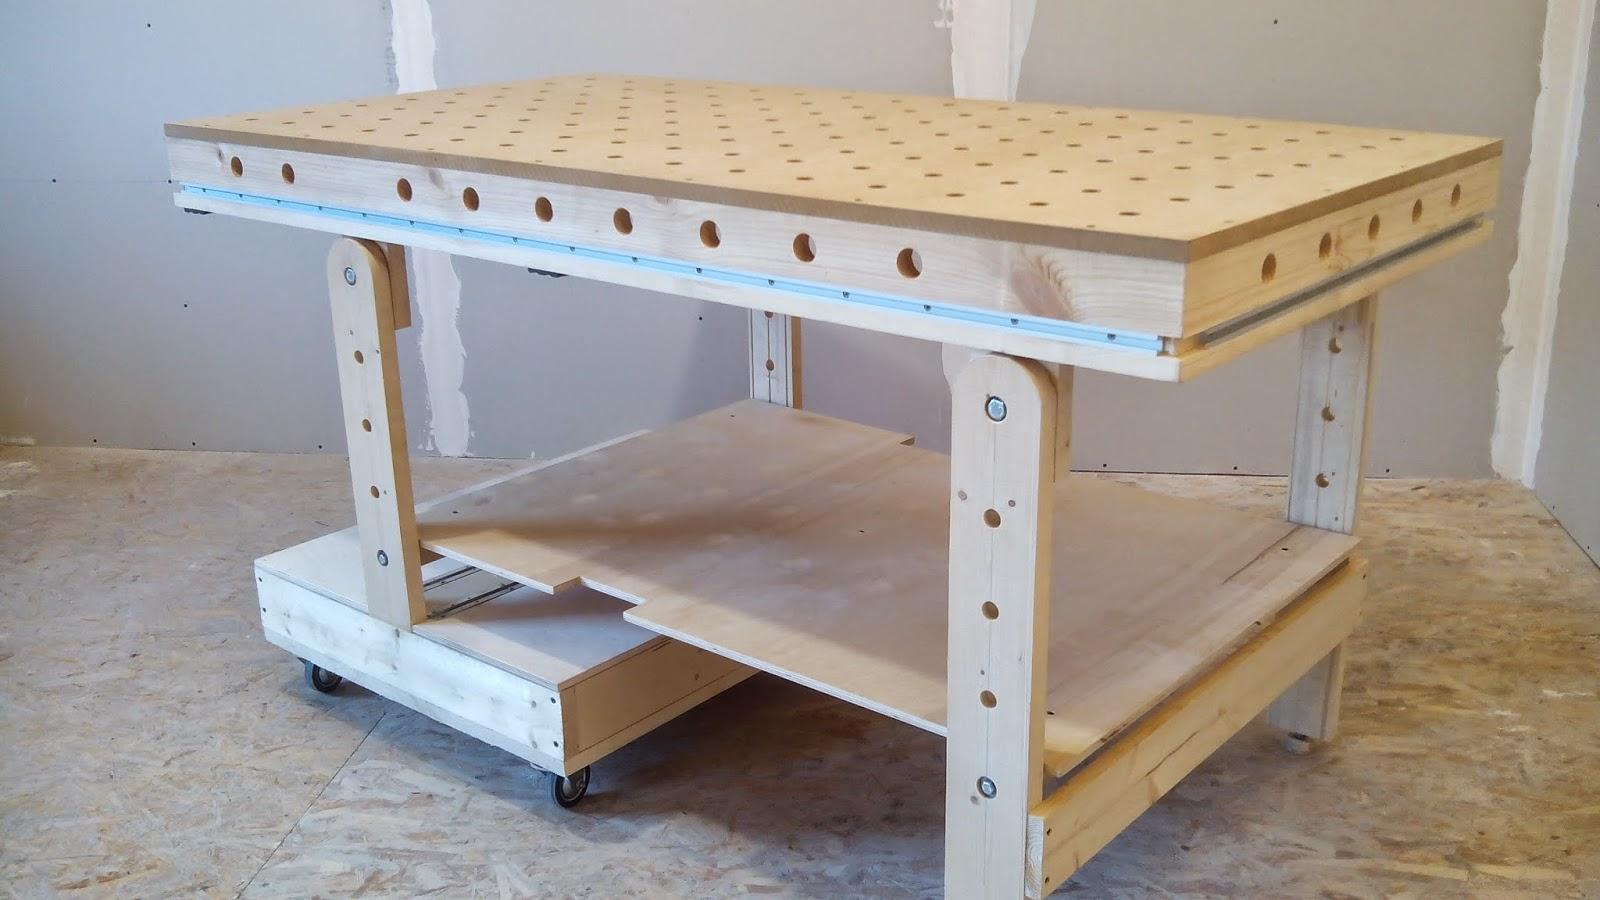 1000 images about shop on pinterest workbenches miter. Black Bedroom Furniture Sets. Home Design Ideas